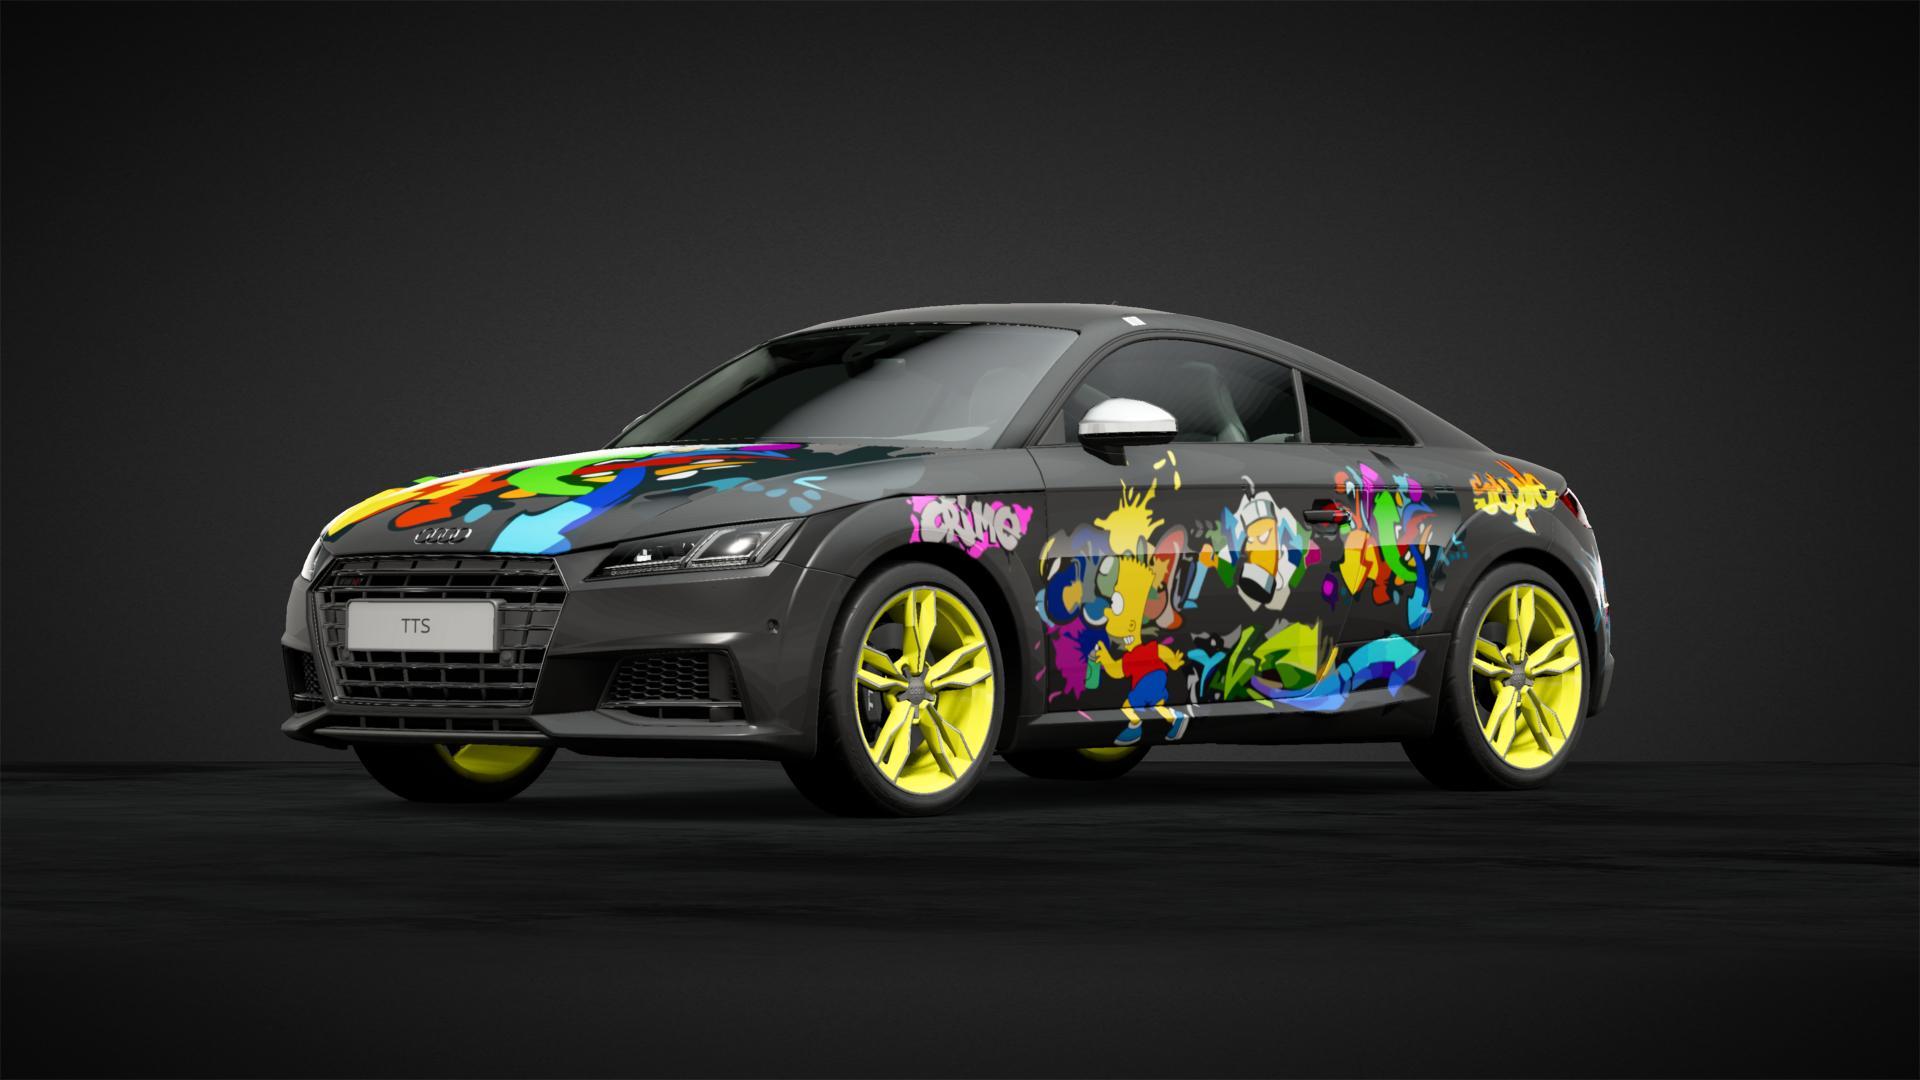 Bart graffiti - Car Livery by DoctorBrisket | Community